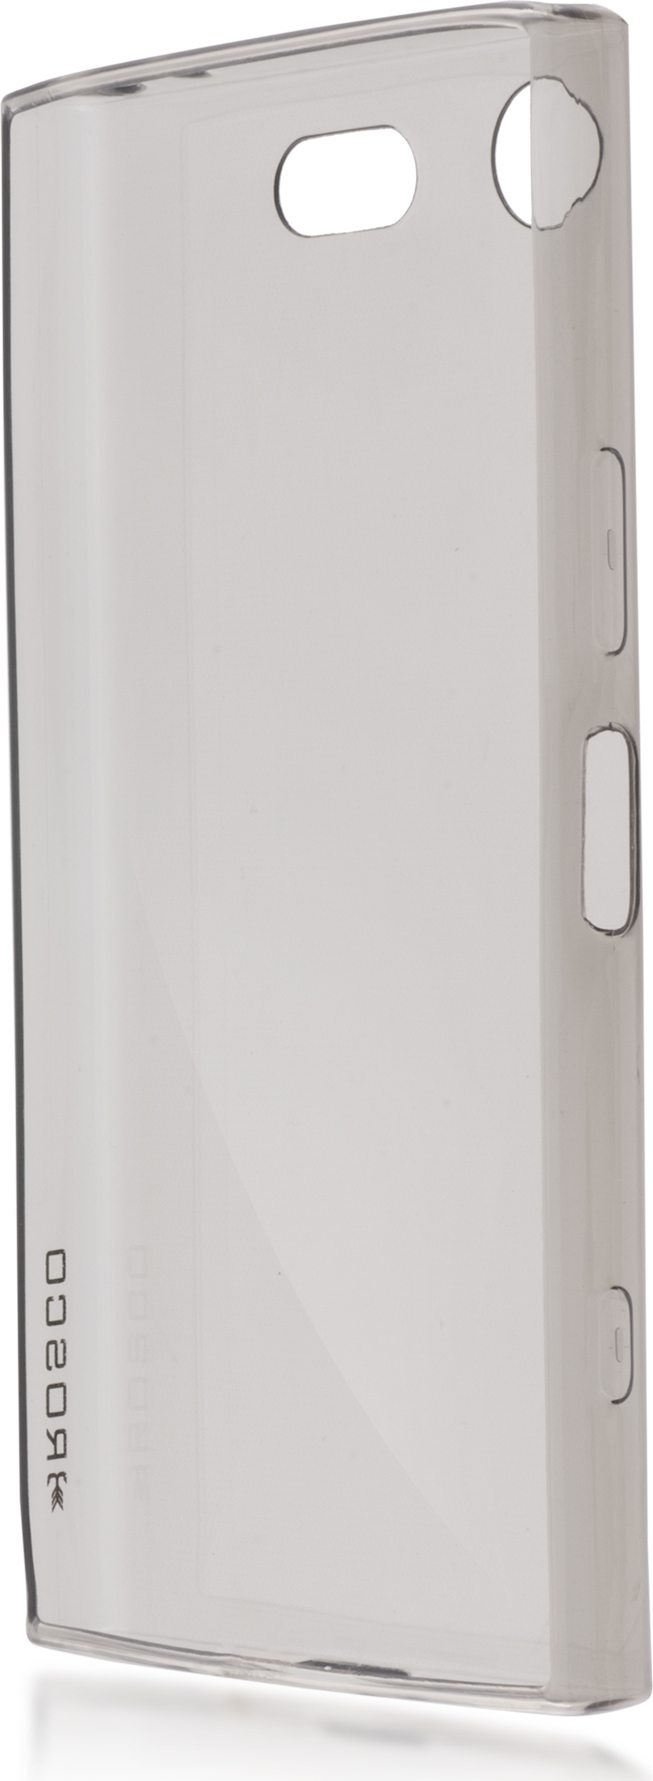 Чехол Brosco TPU для Sony Xperia XZ1 Compact, черный